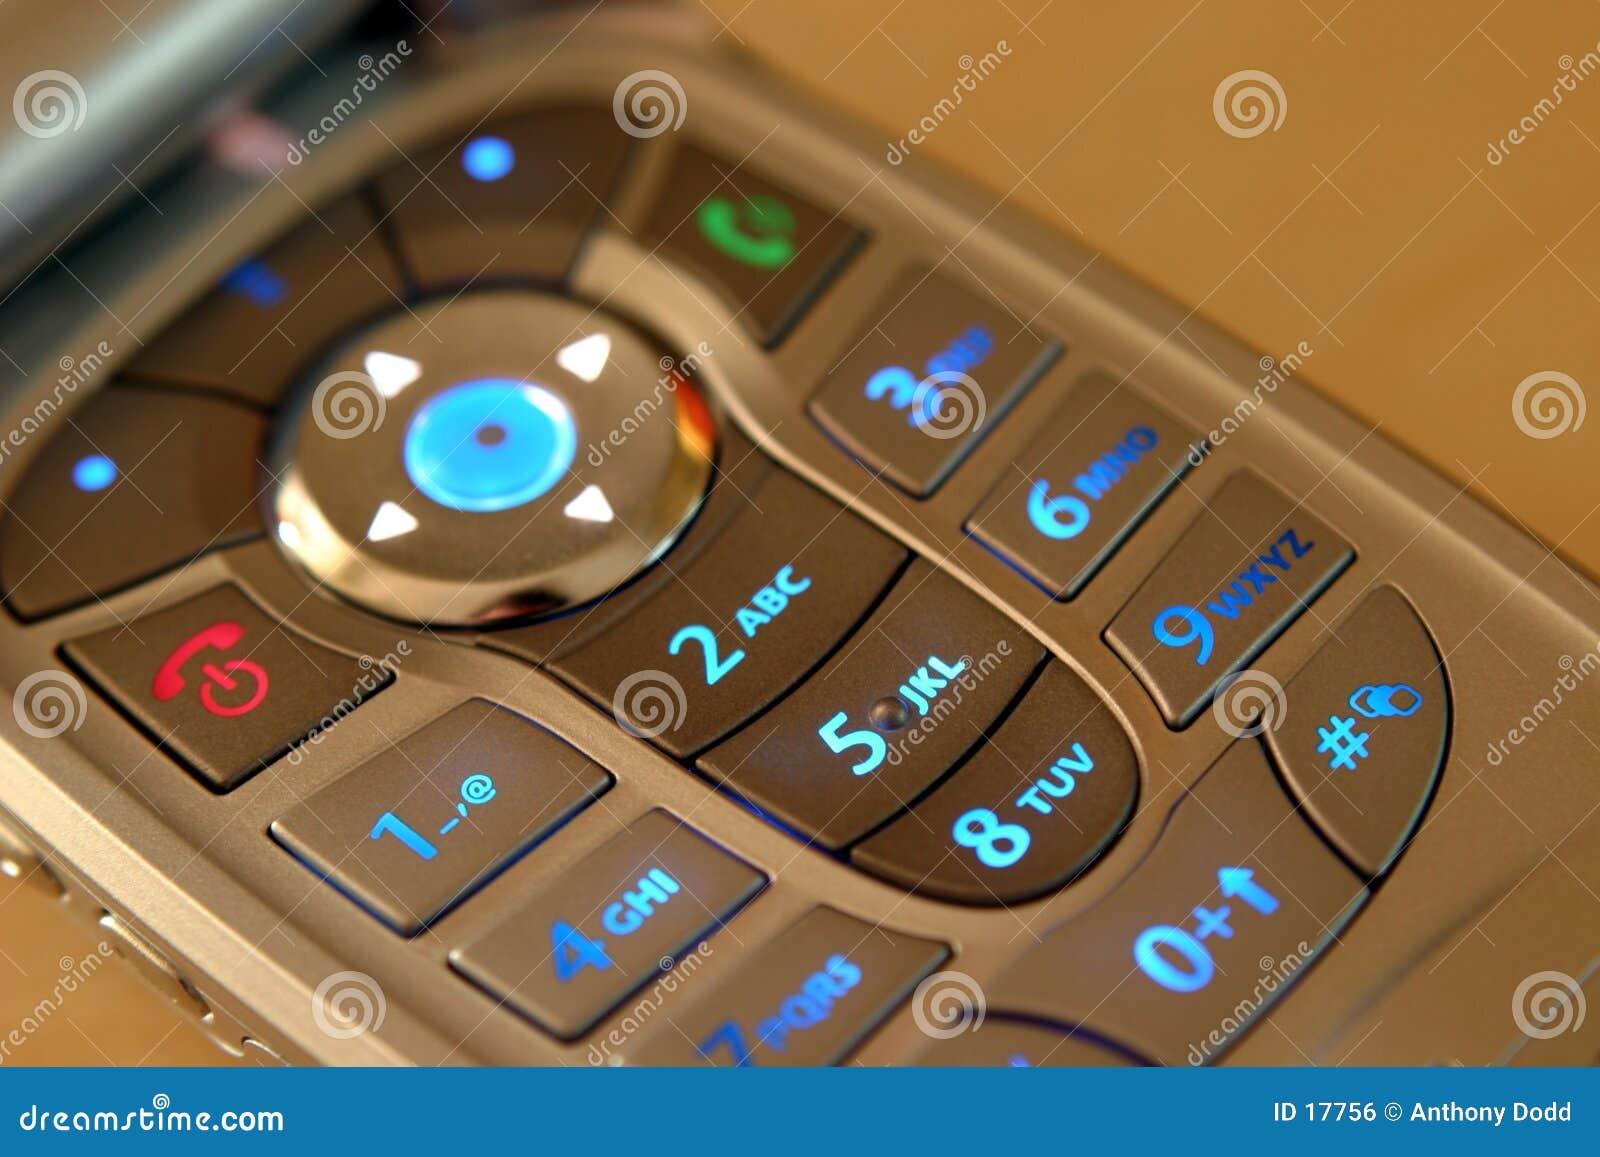 Teléfono móvil, telclado numérico iluminado